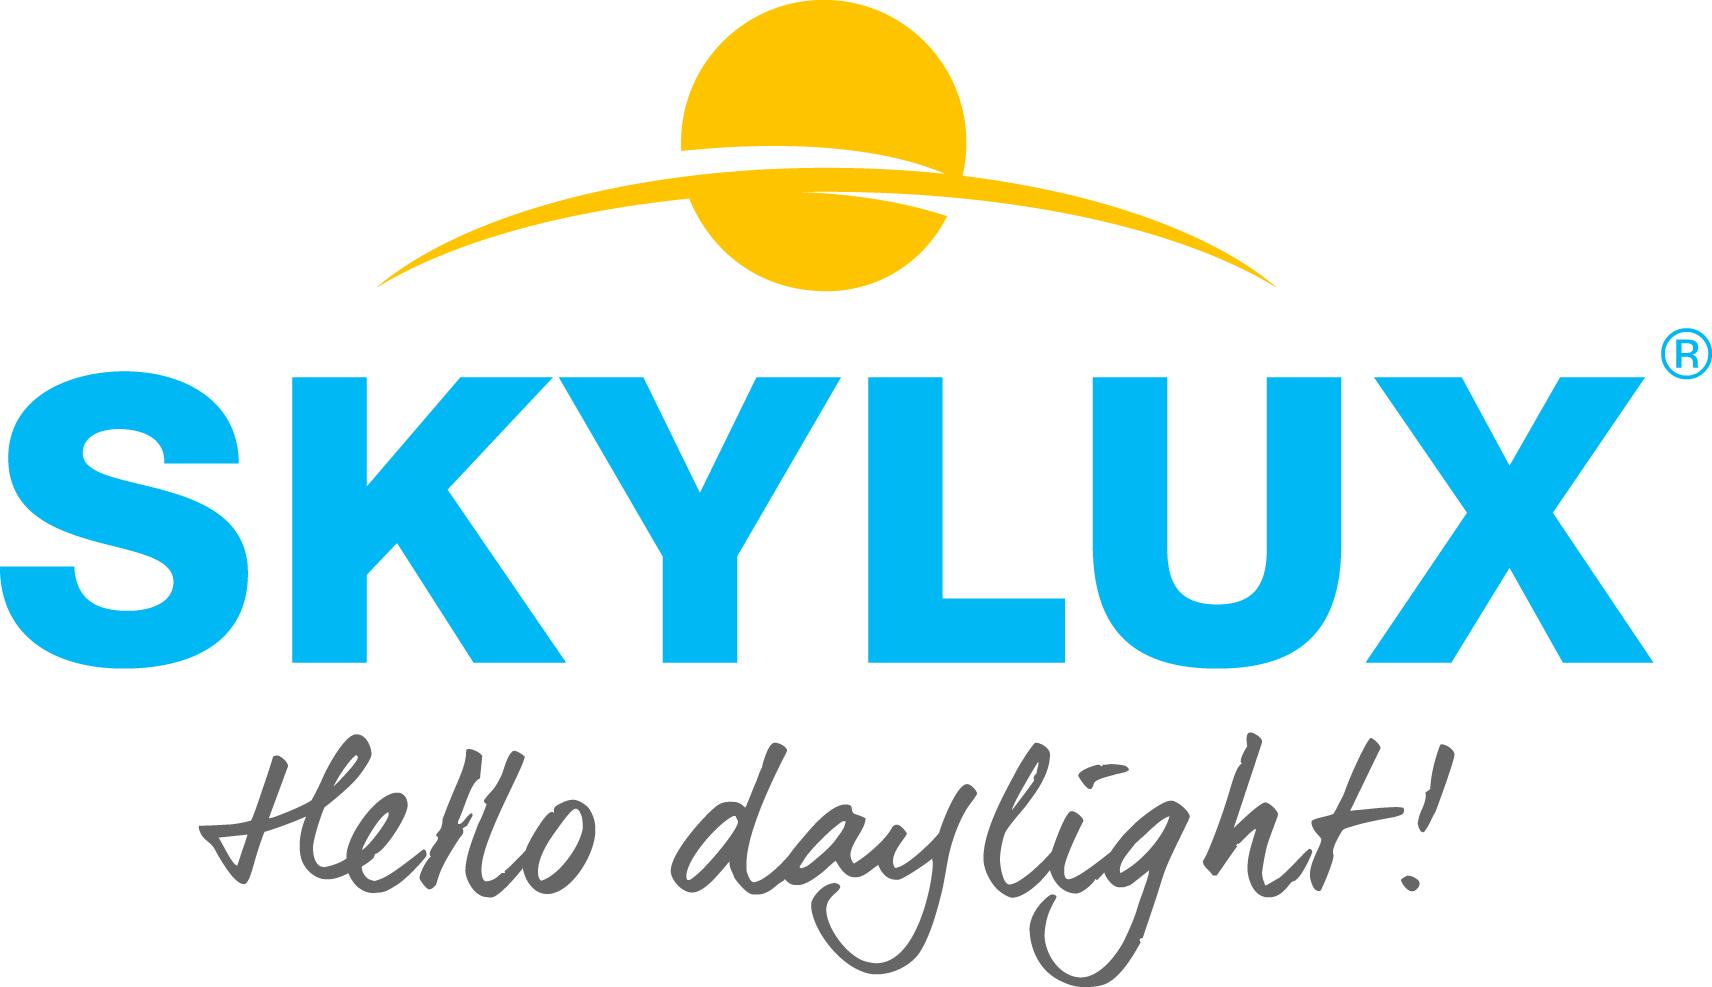 SKYLUX-outl logo Q-®.jpg